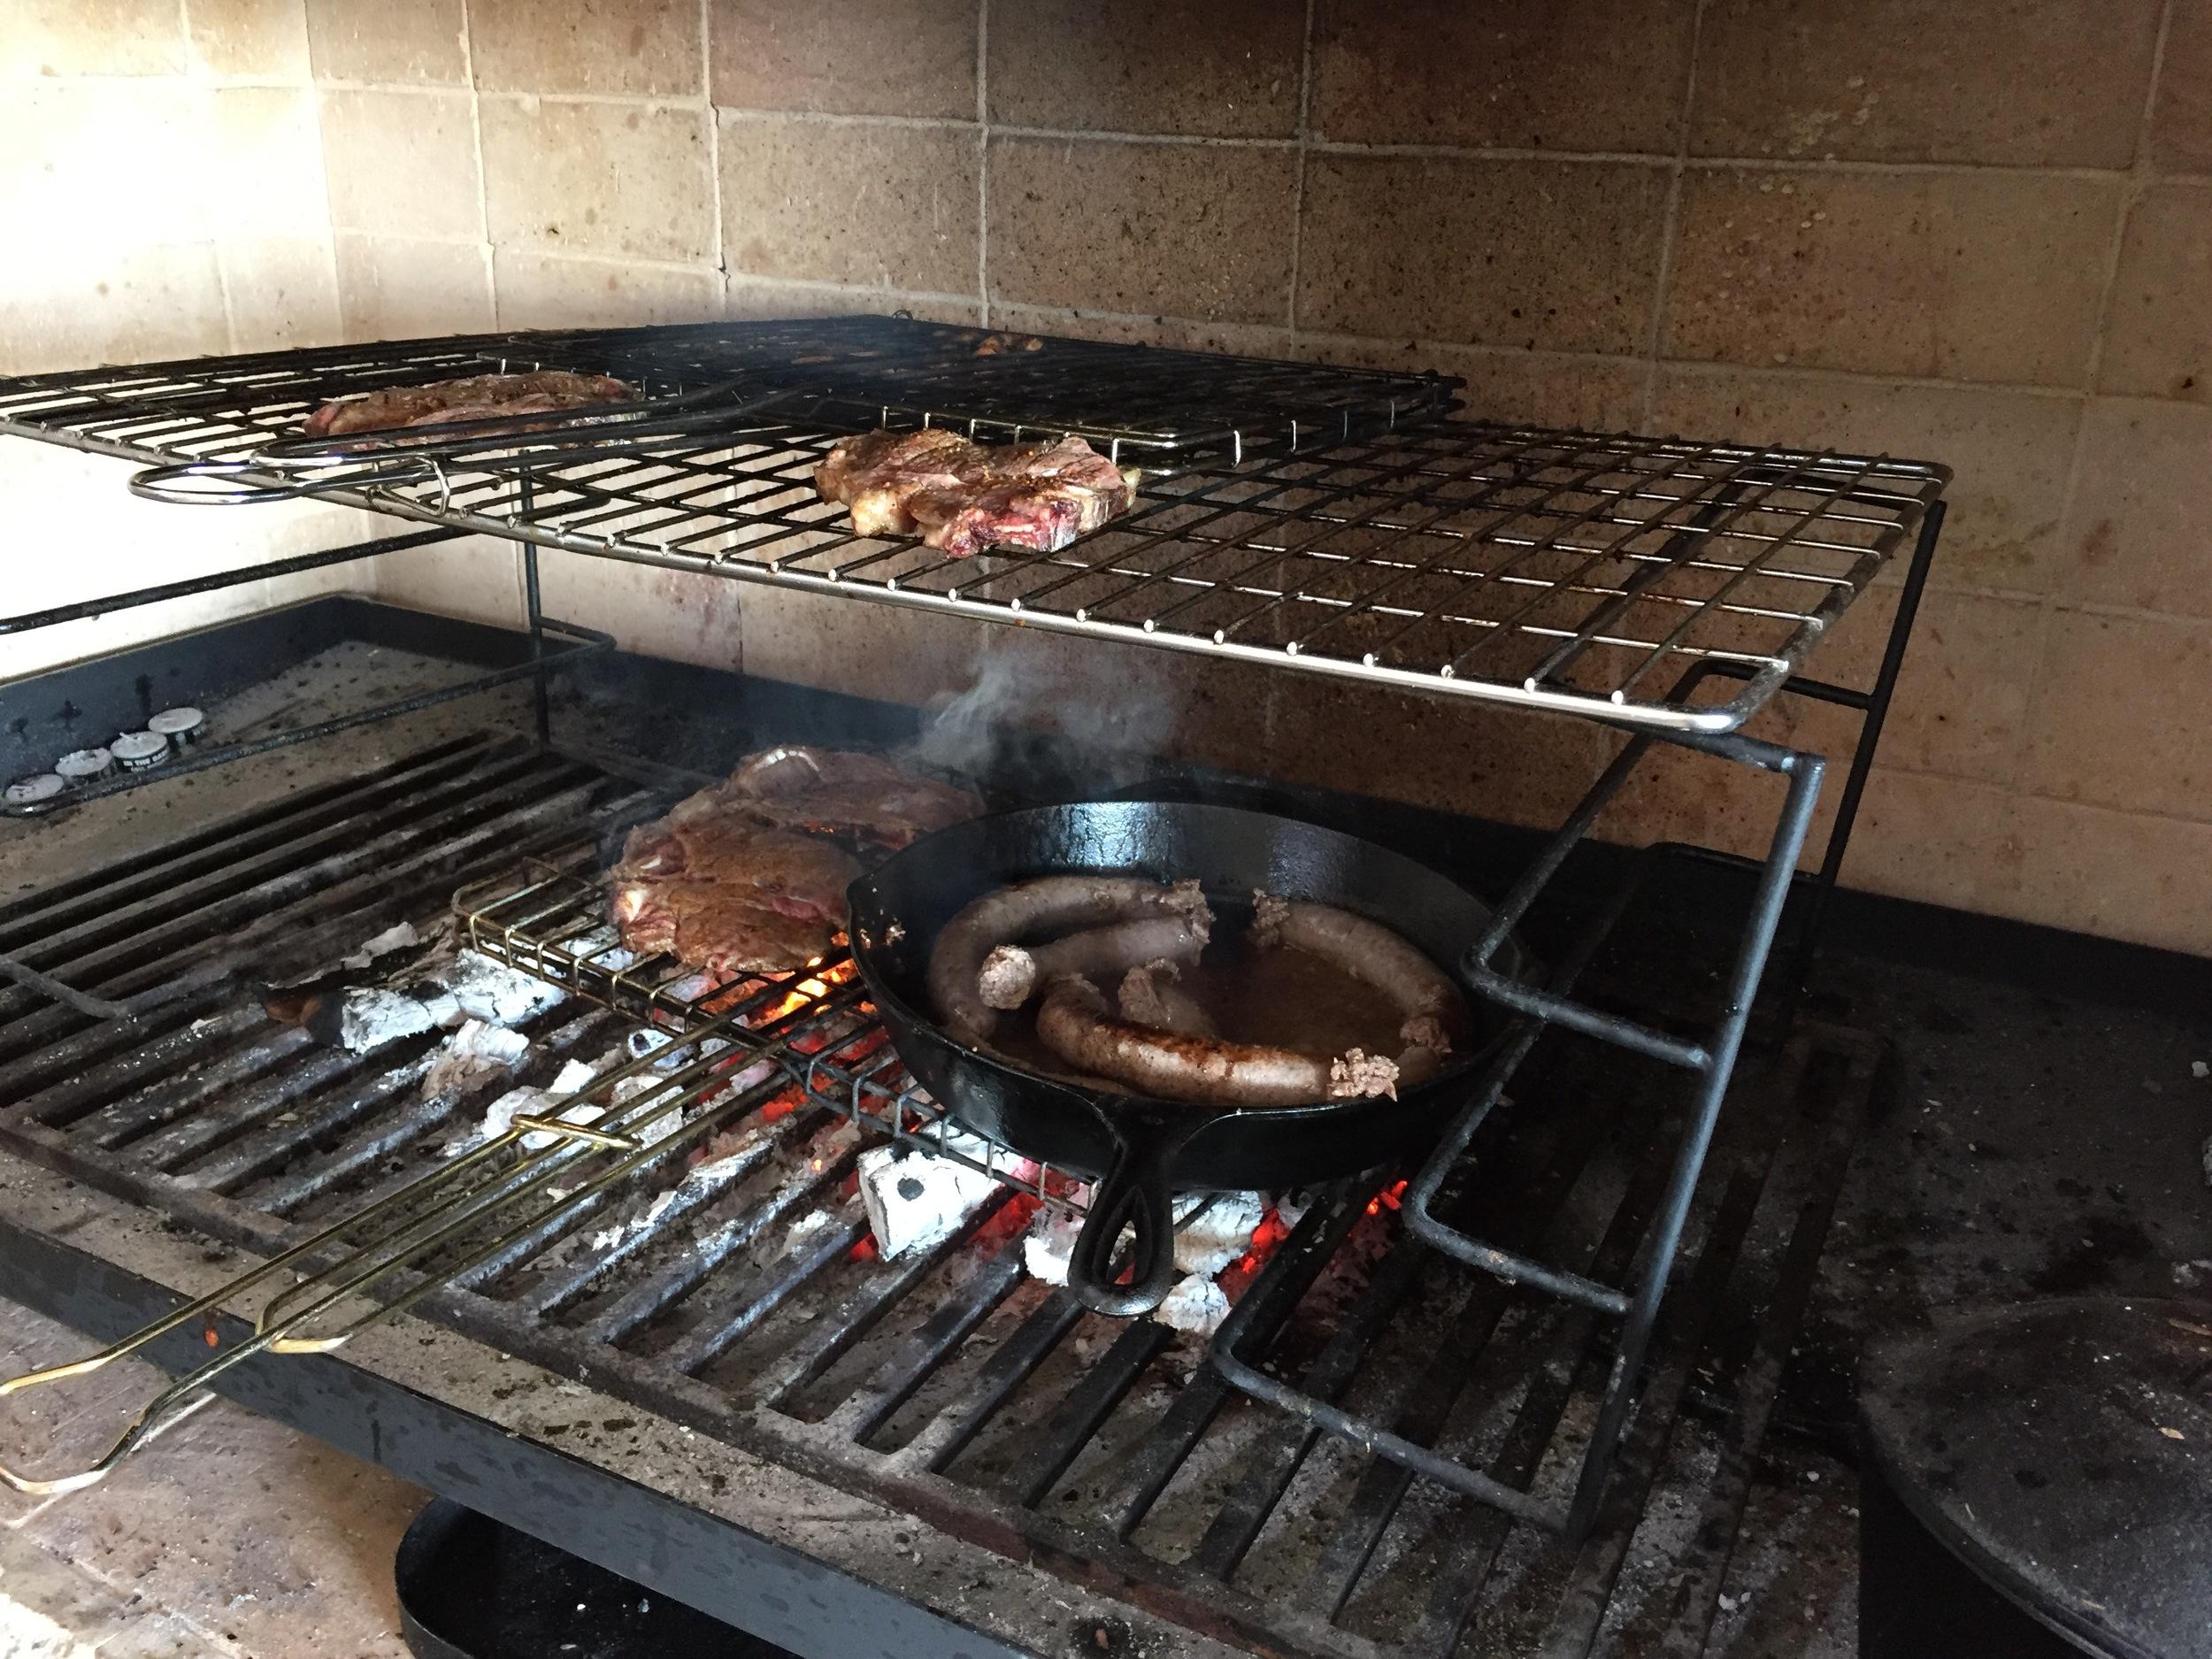 Boom! Steaks, chicken kabobs, boerewors (farmers' sausage).